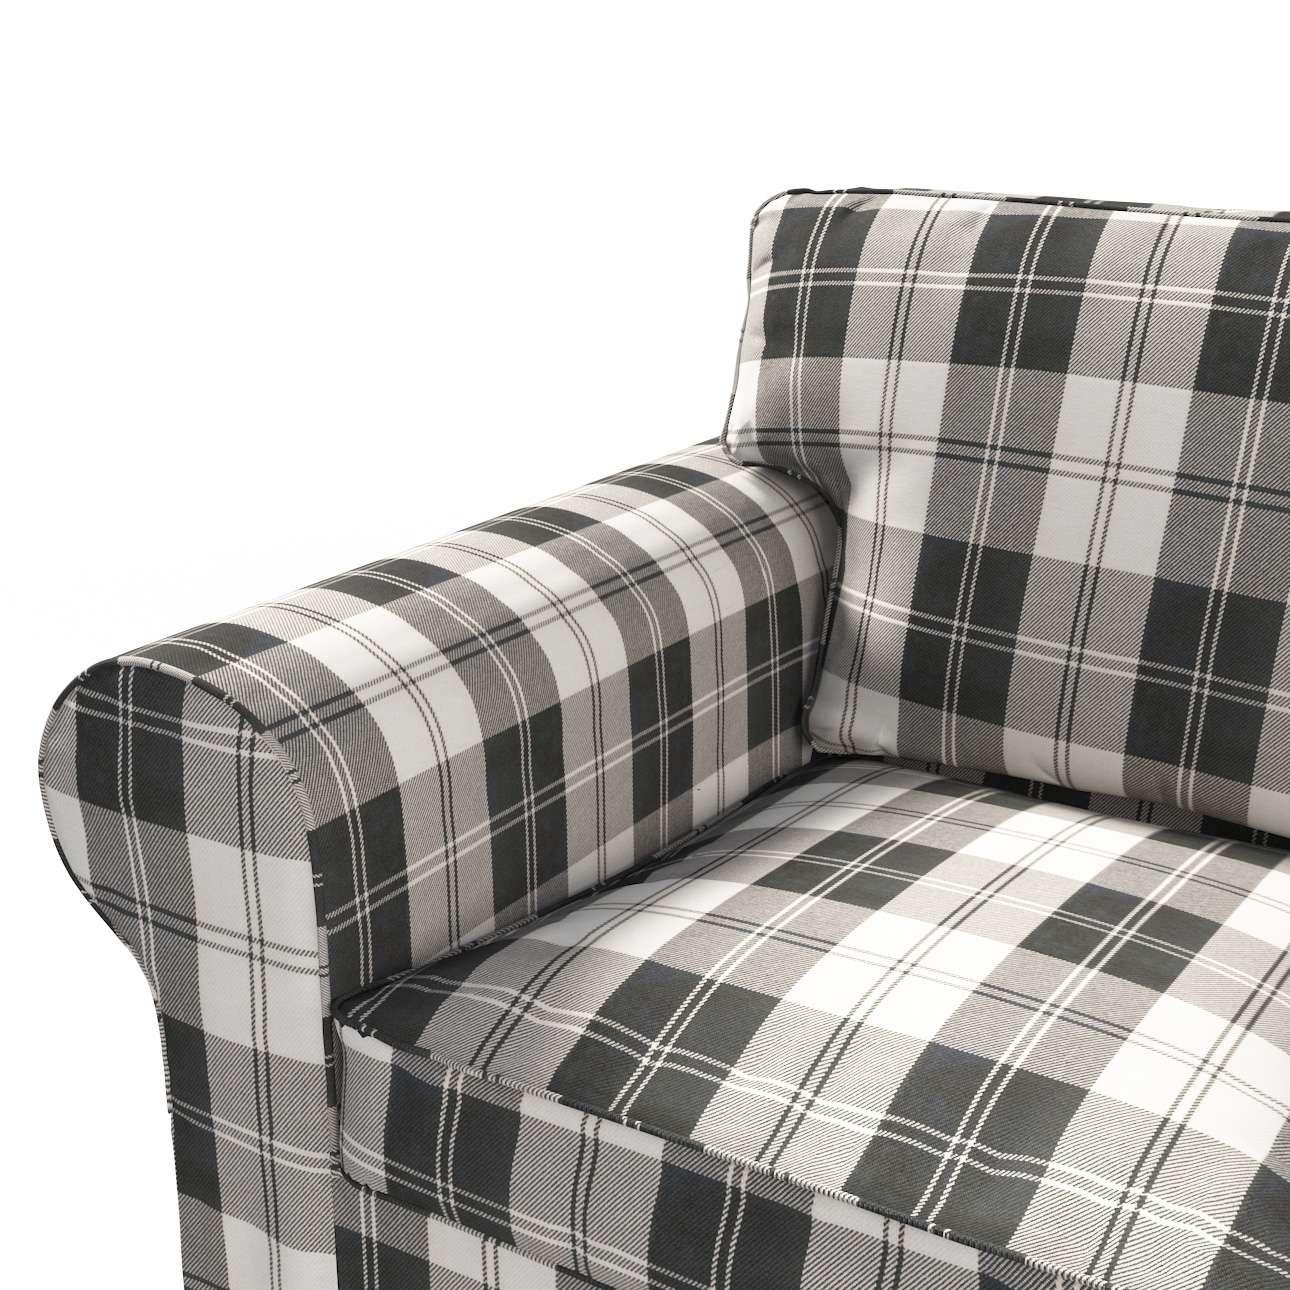 Ektorp 2-Sitzer Schlafsofabezug  ALTES Modell Sofabezug Ektorp 2-Sitzer Schlafsofa altes Modell von der Kollektion Edinburgh , Stoff: 115-74